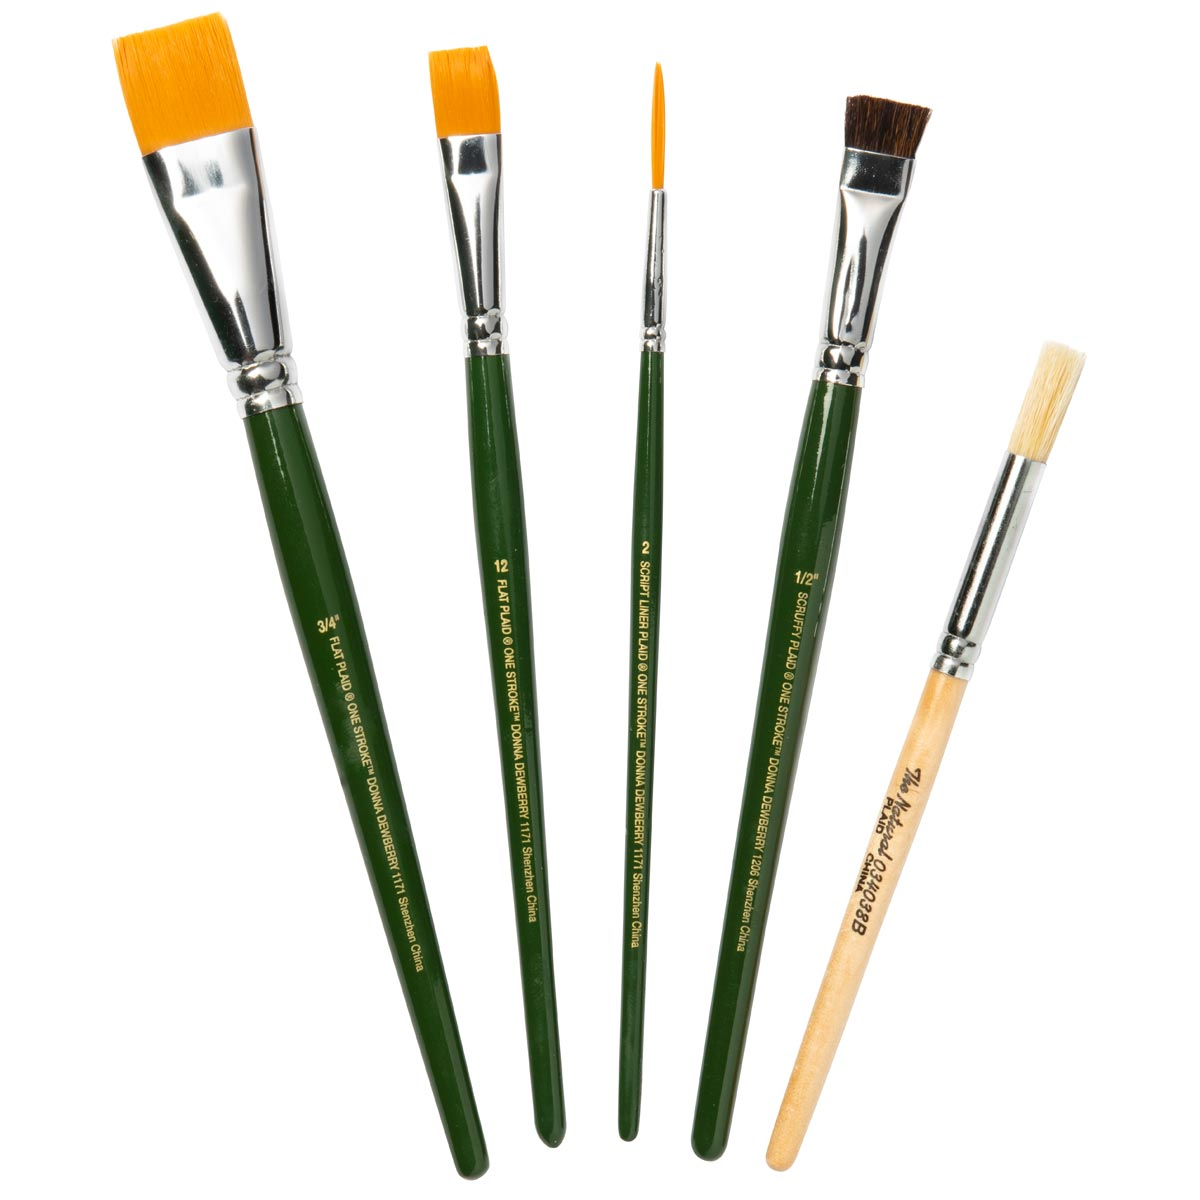 FolkArt ® One Stroke™ Home Town Painting Kit - 99492